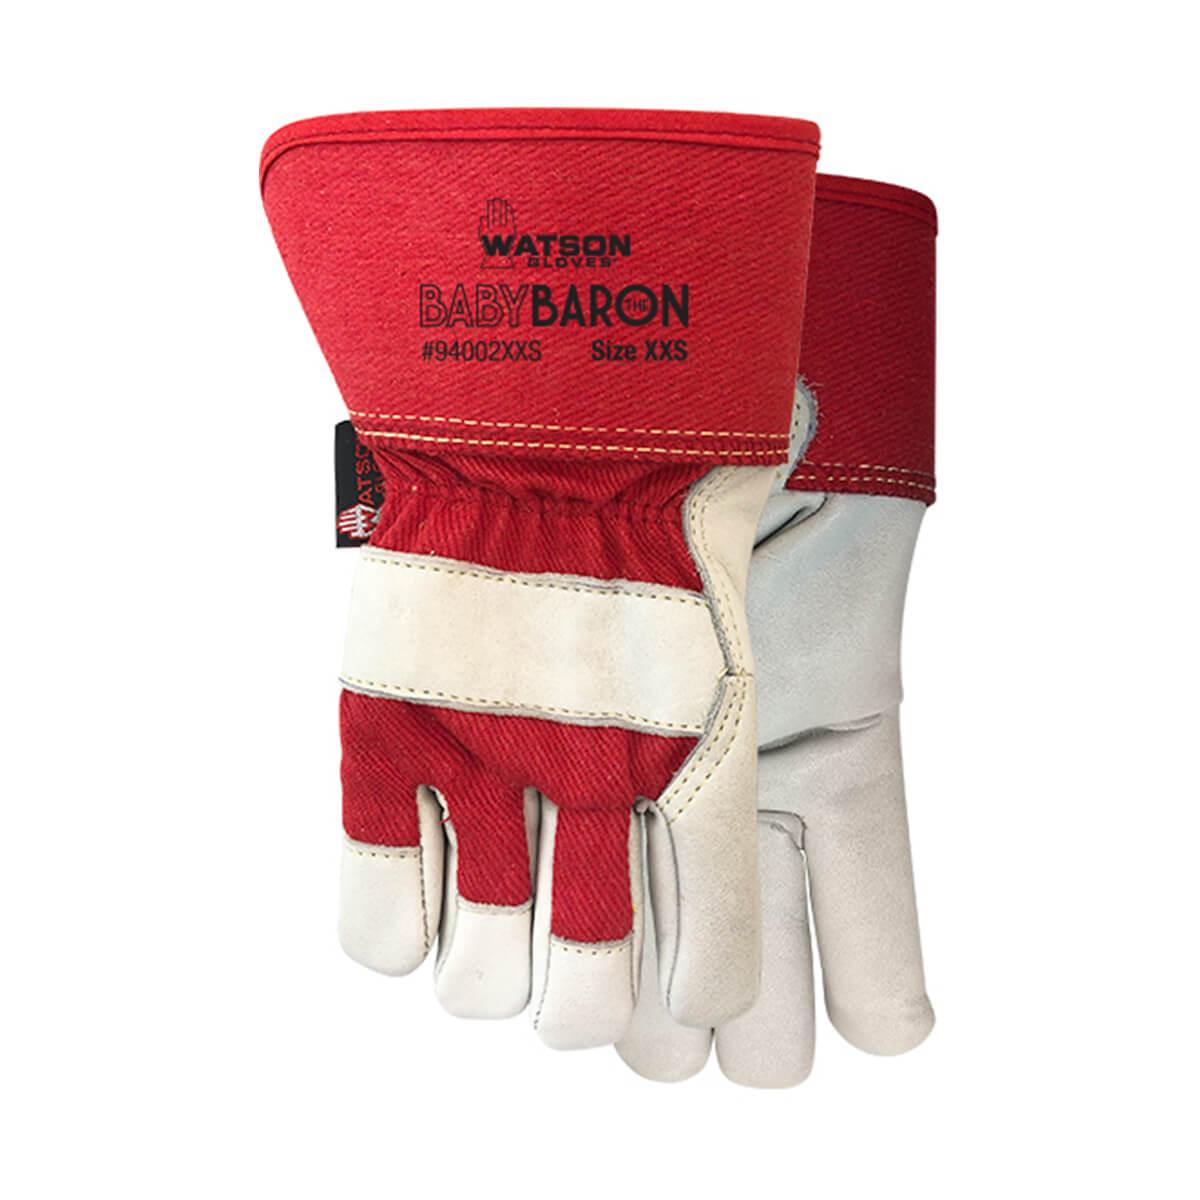 Baby Baron Sherpa Lined Glove - XXS